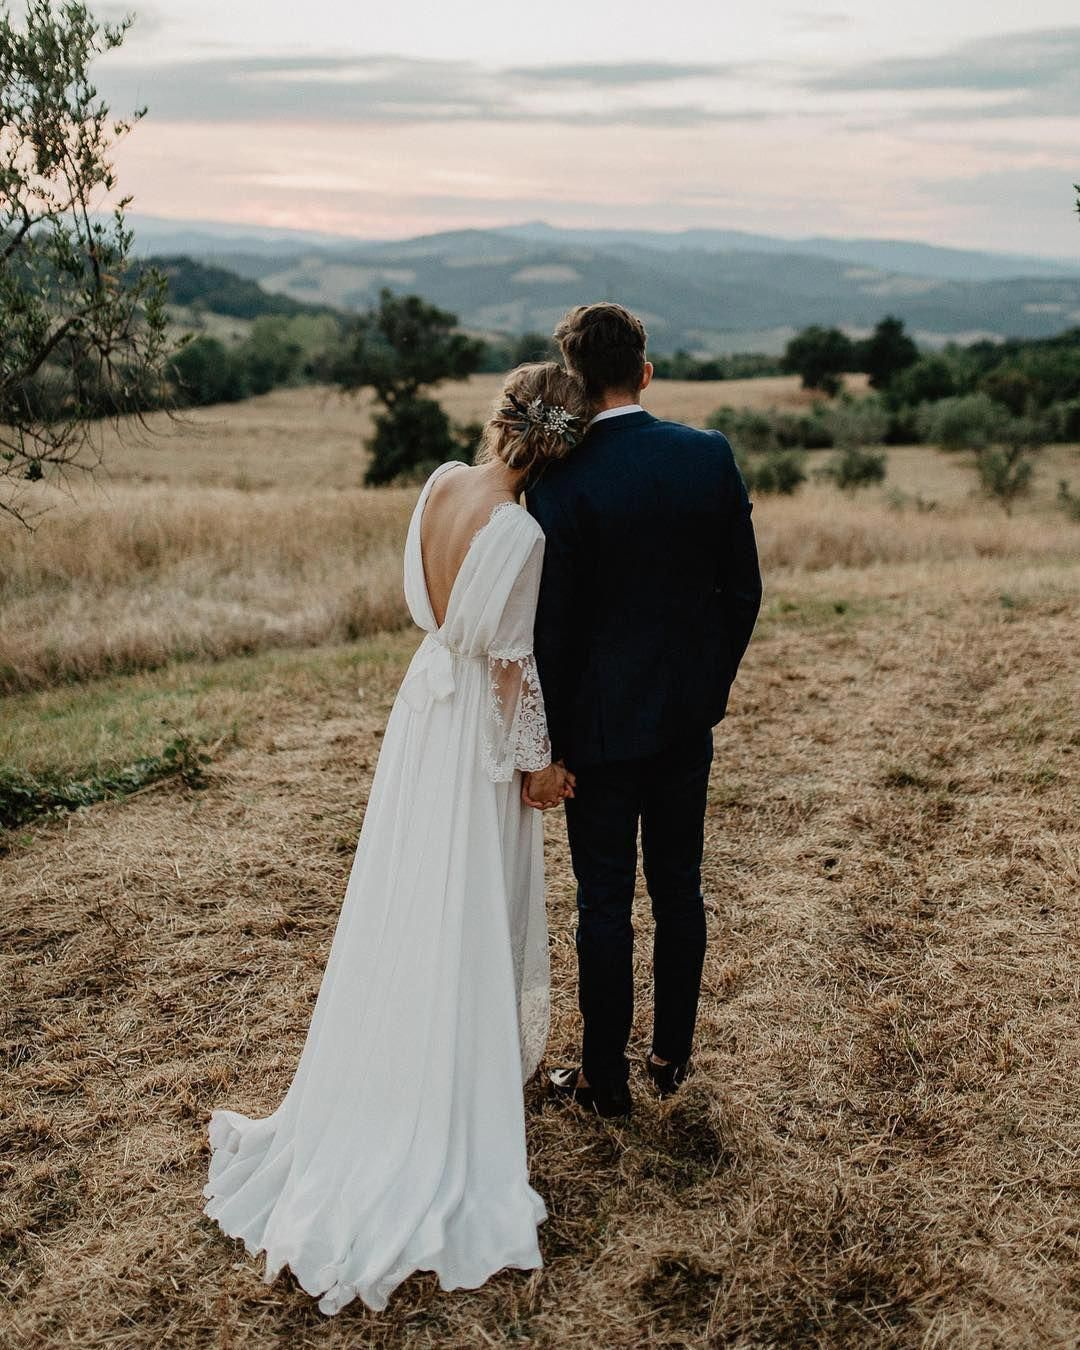 Bride And Groom Wedding Photo Ideas Weddingideas Weddingphotography Bohowedding Weddingin Wedding Photography Bride Bridal Photography Poses Wedding Photos